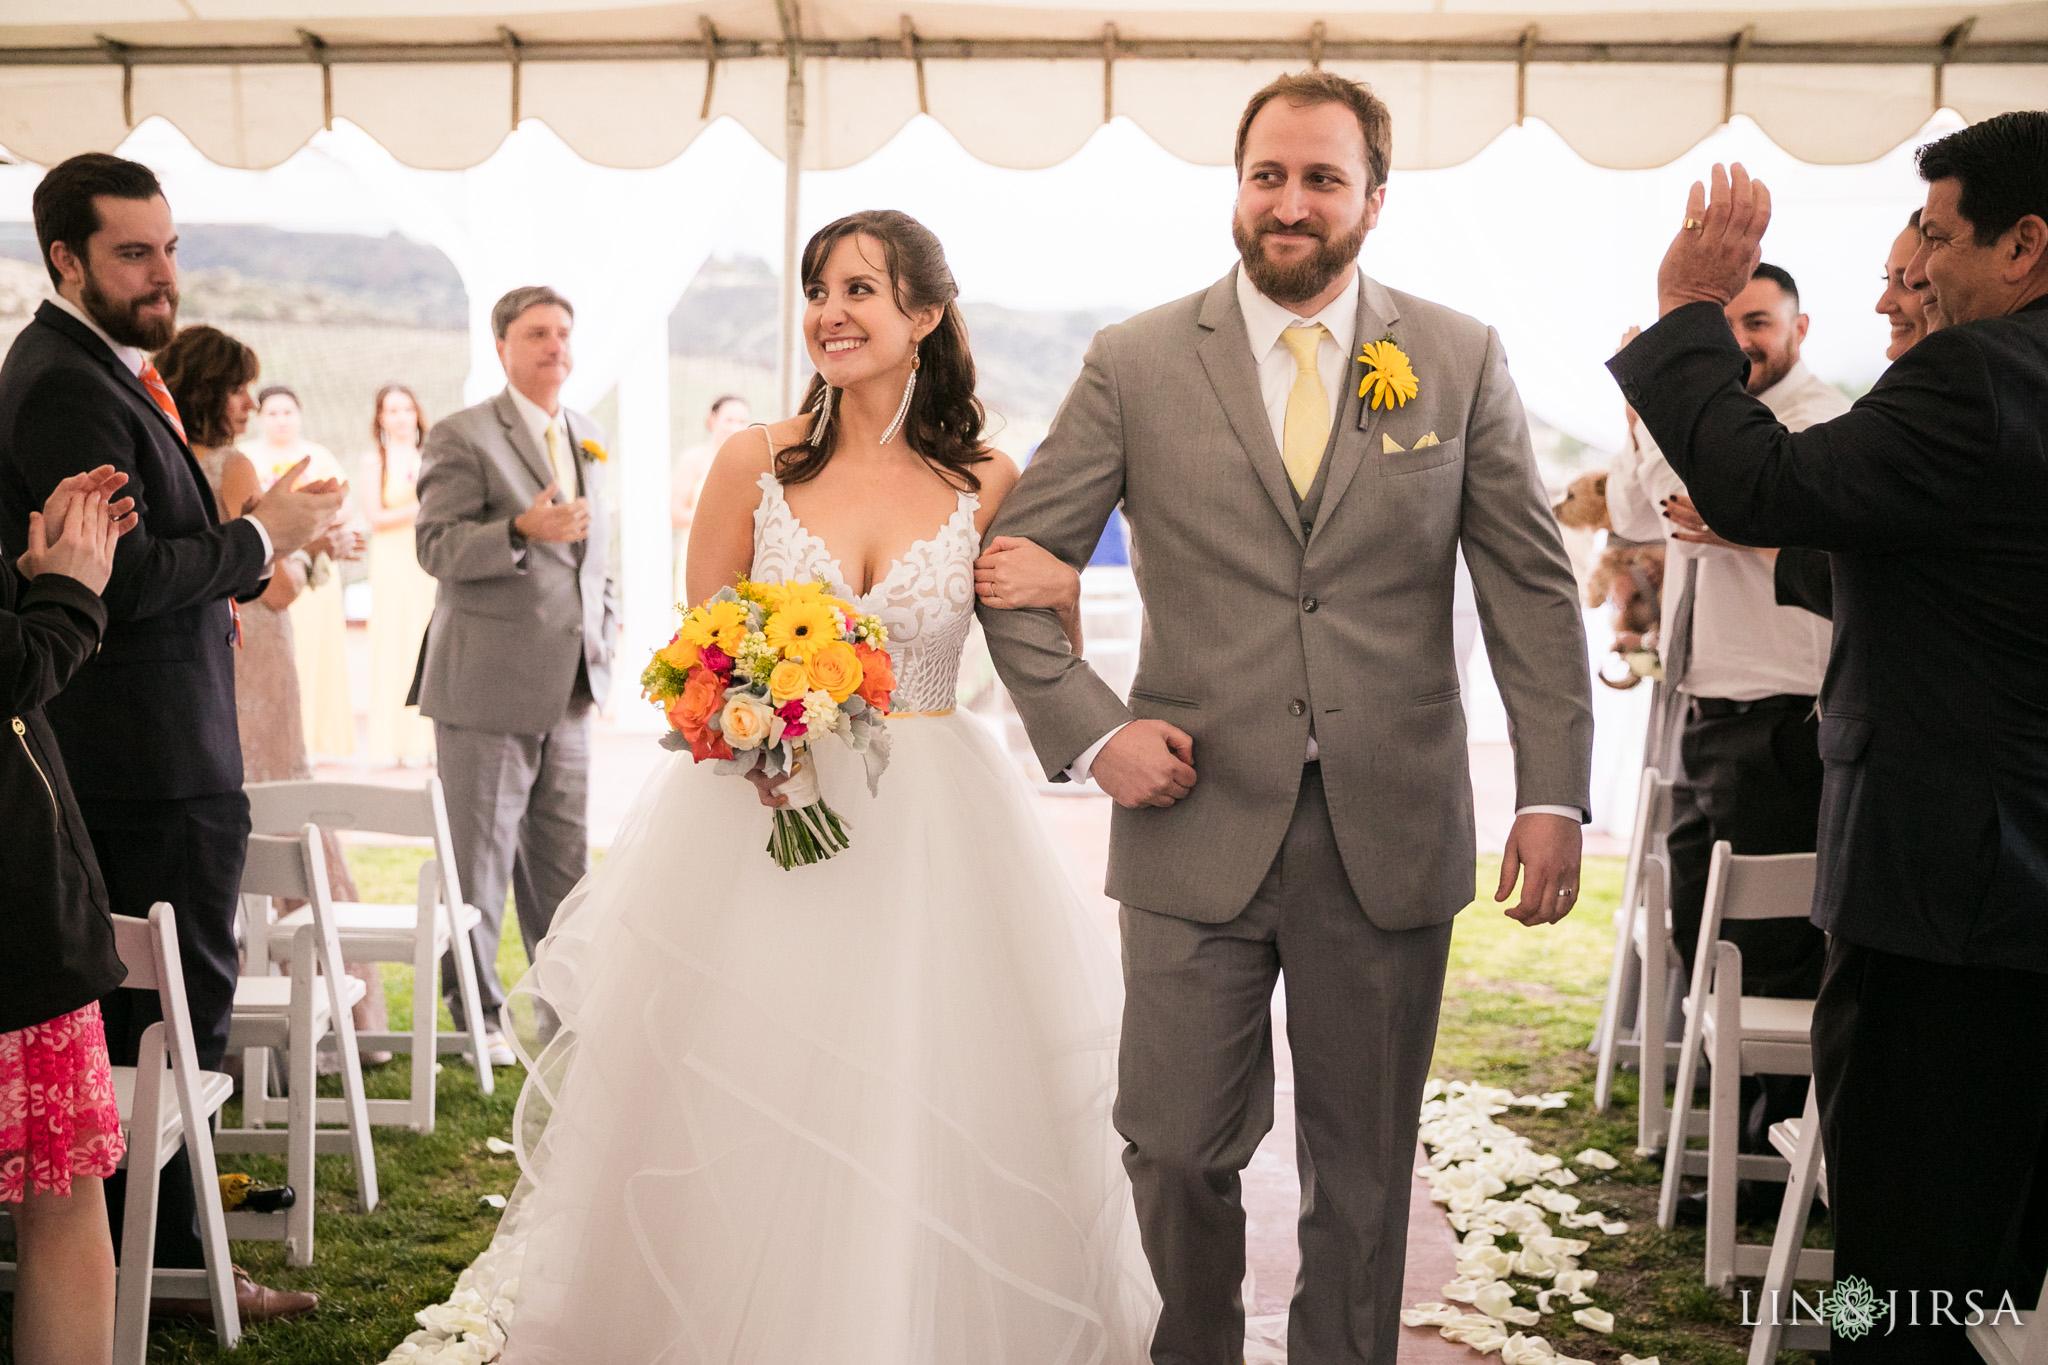 26 leoness cellars temecula wedding ceremony photography